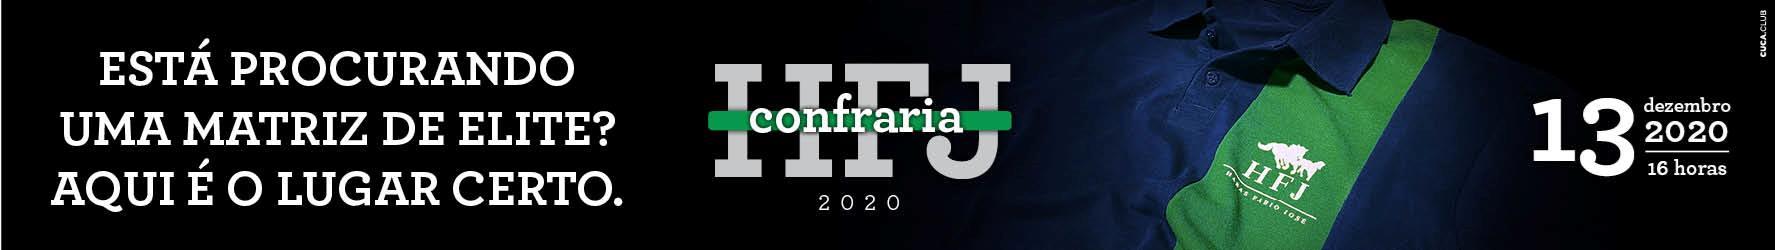 Confraria 2020